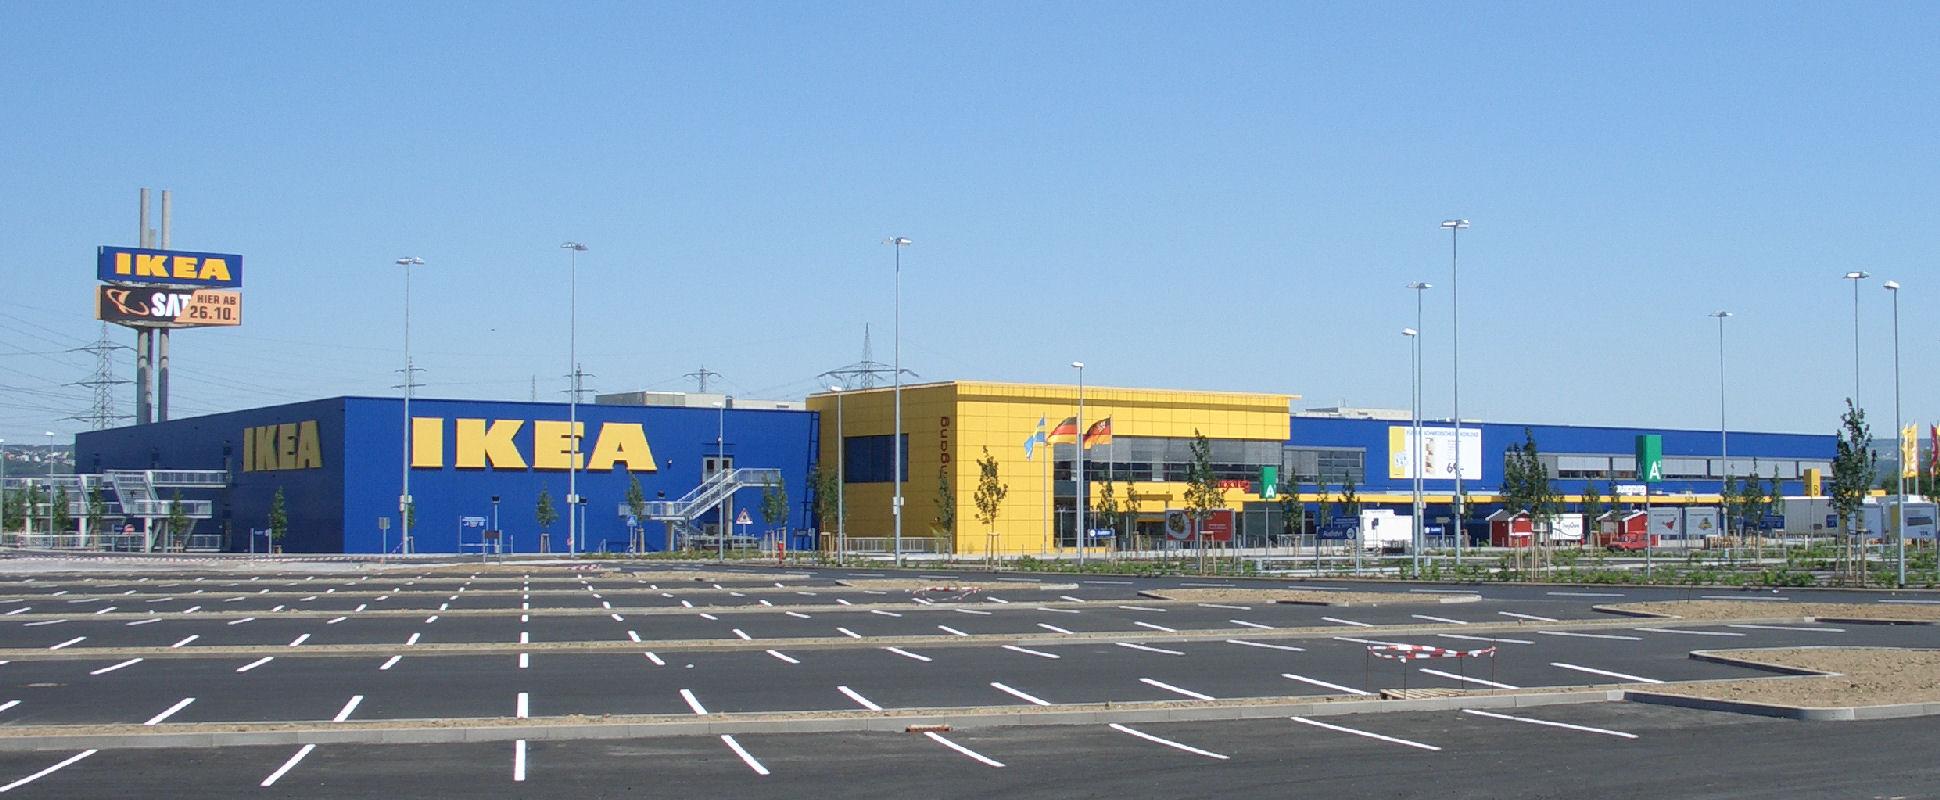 La strategia di IKEA è l'intimidazione